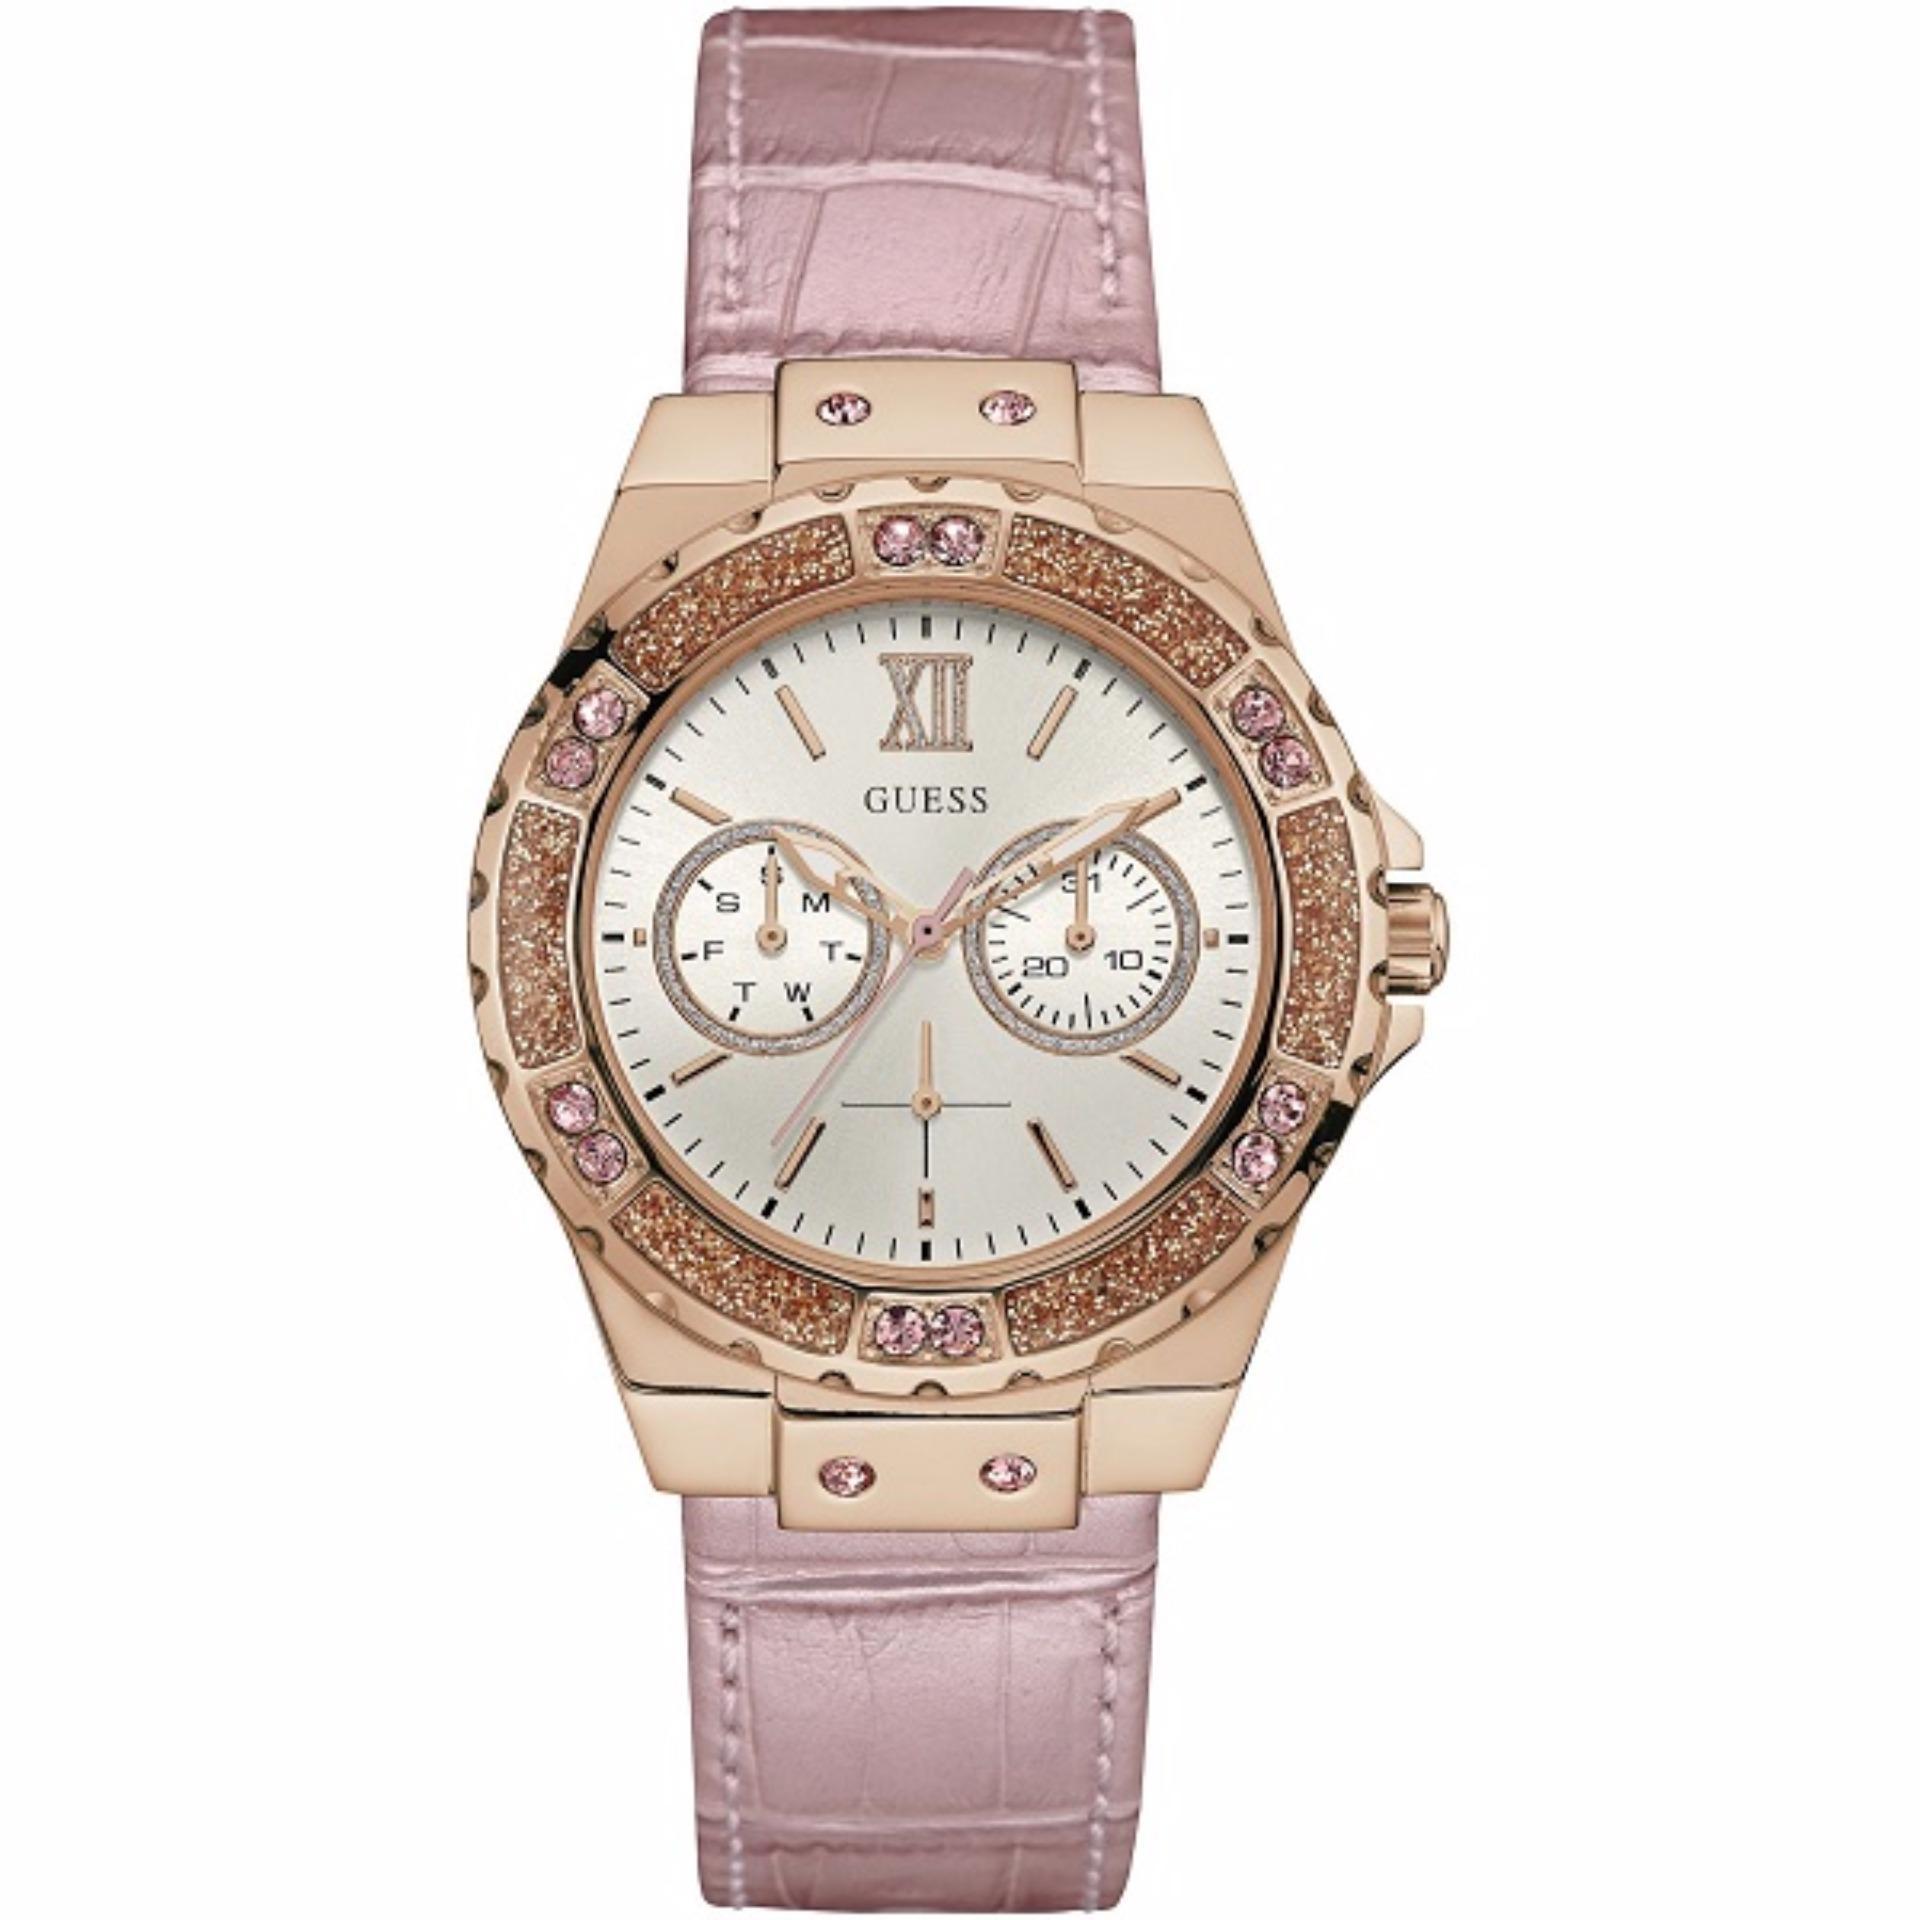 Guess Premium Jam Tangan Wanita Stainless Steel W0479g3 Spec W0231l6 Multifunction Biru Gold Strap Pink W0775l3